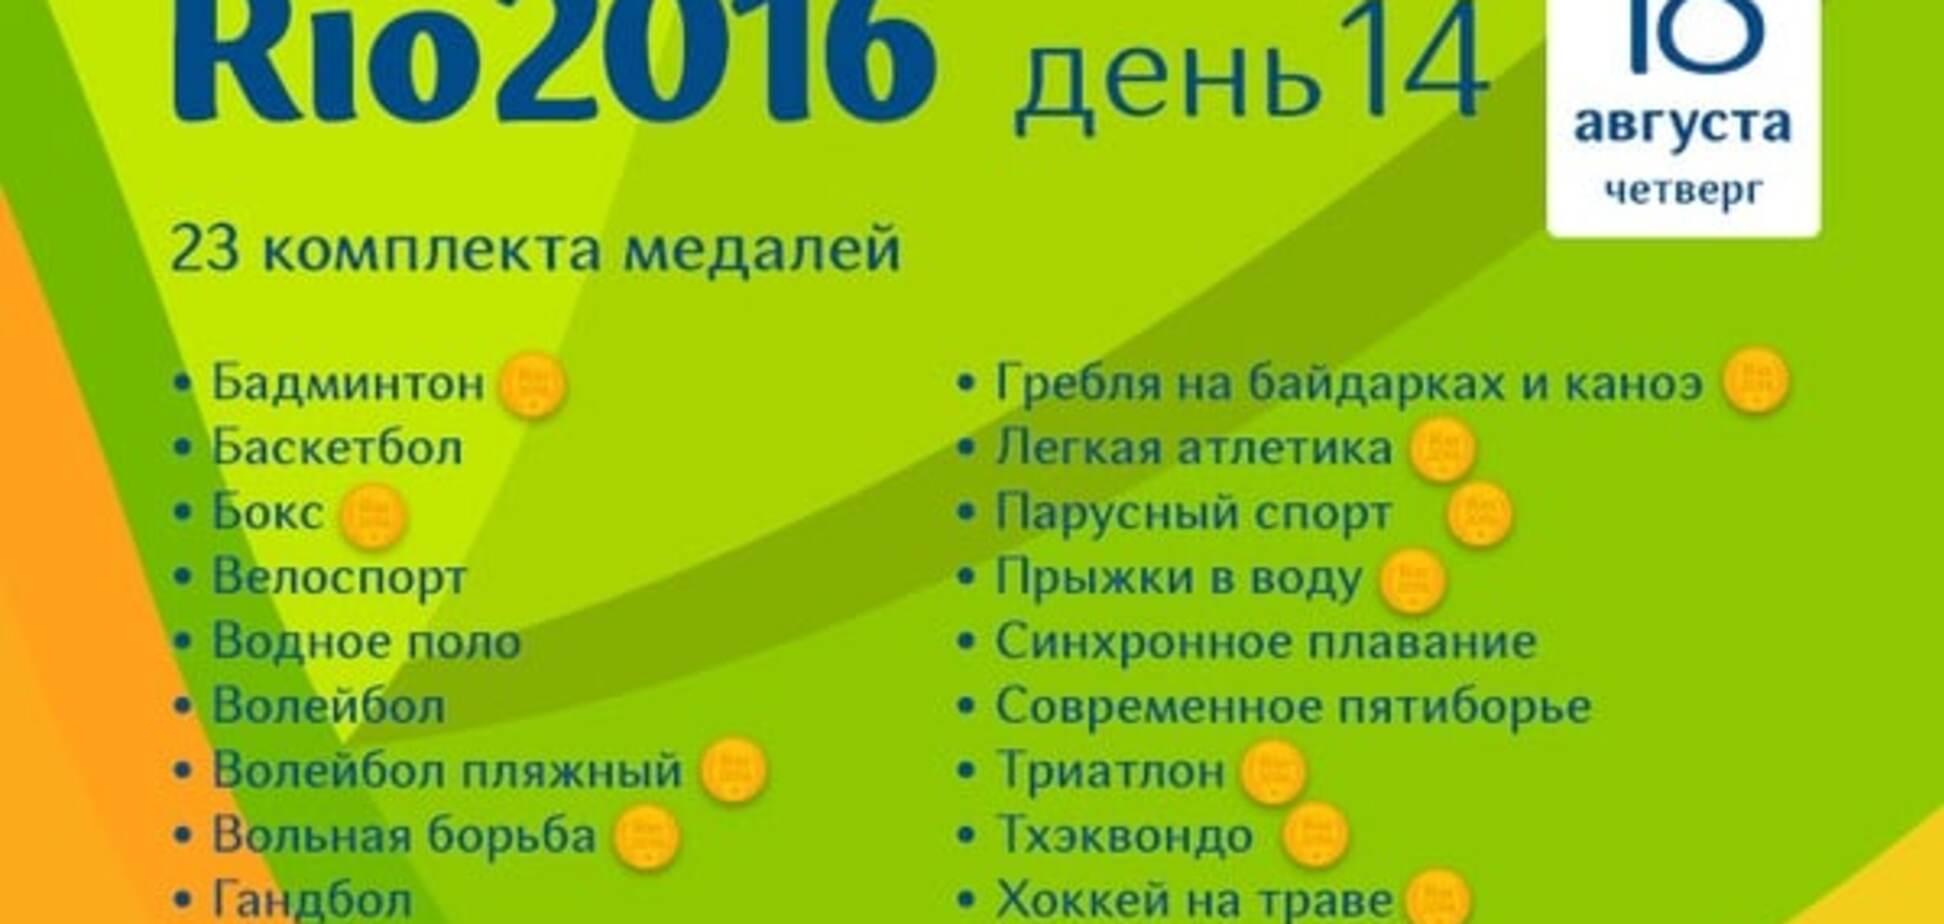 Олимпиада-2016 онлайн